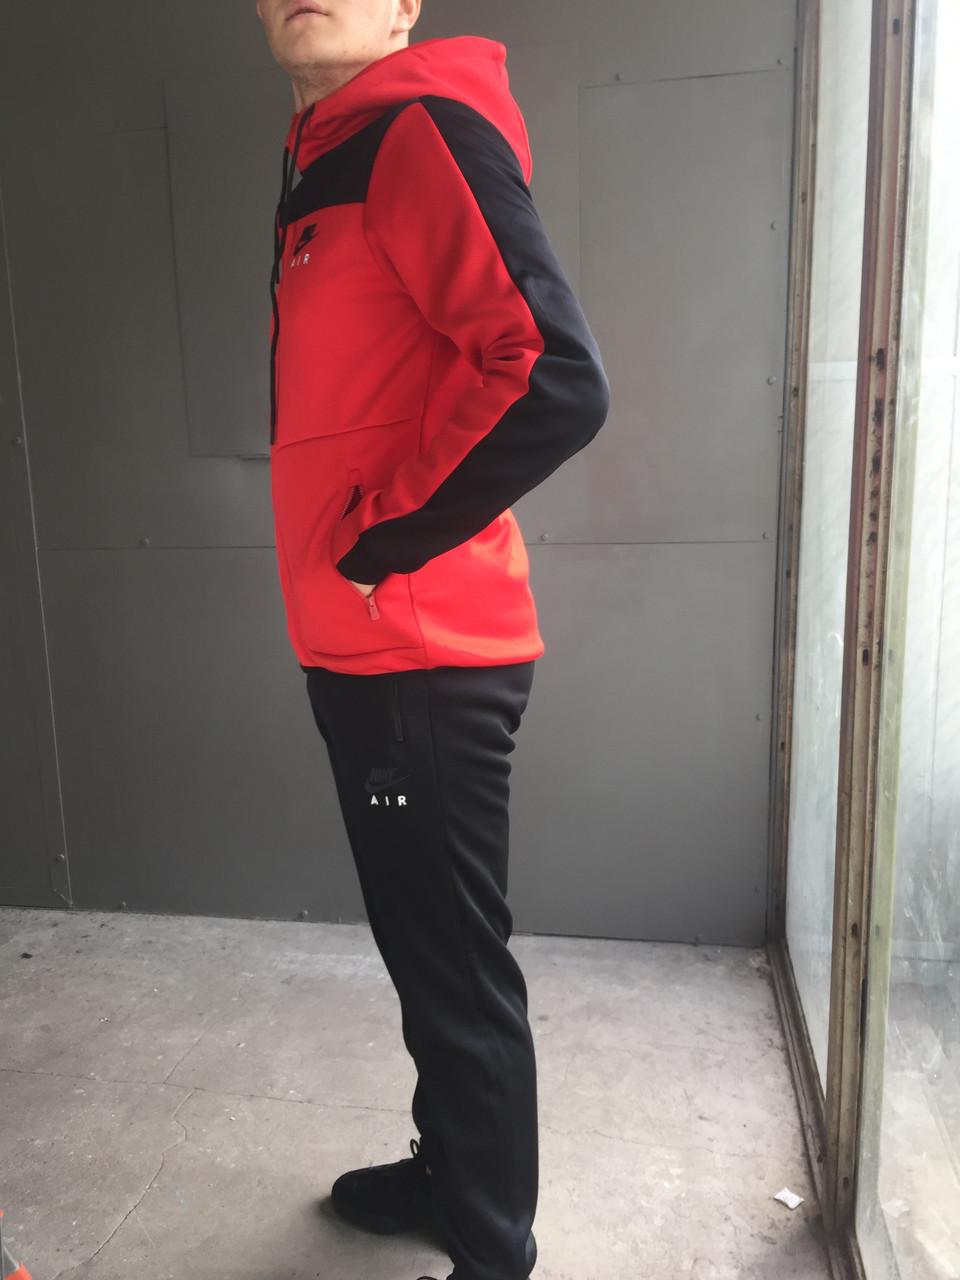 Мужской спортивный костюм Nike Air (красный) (зима)